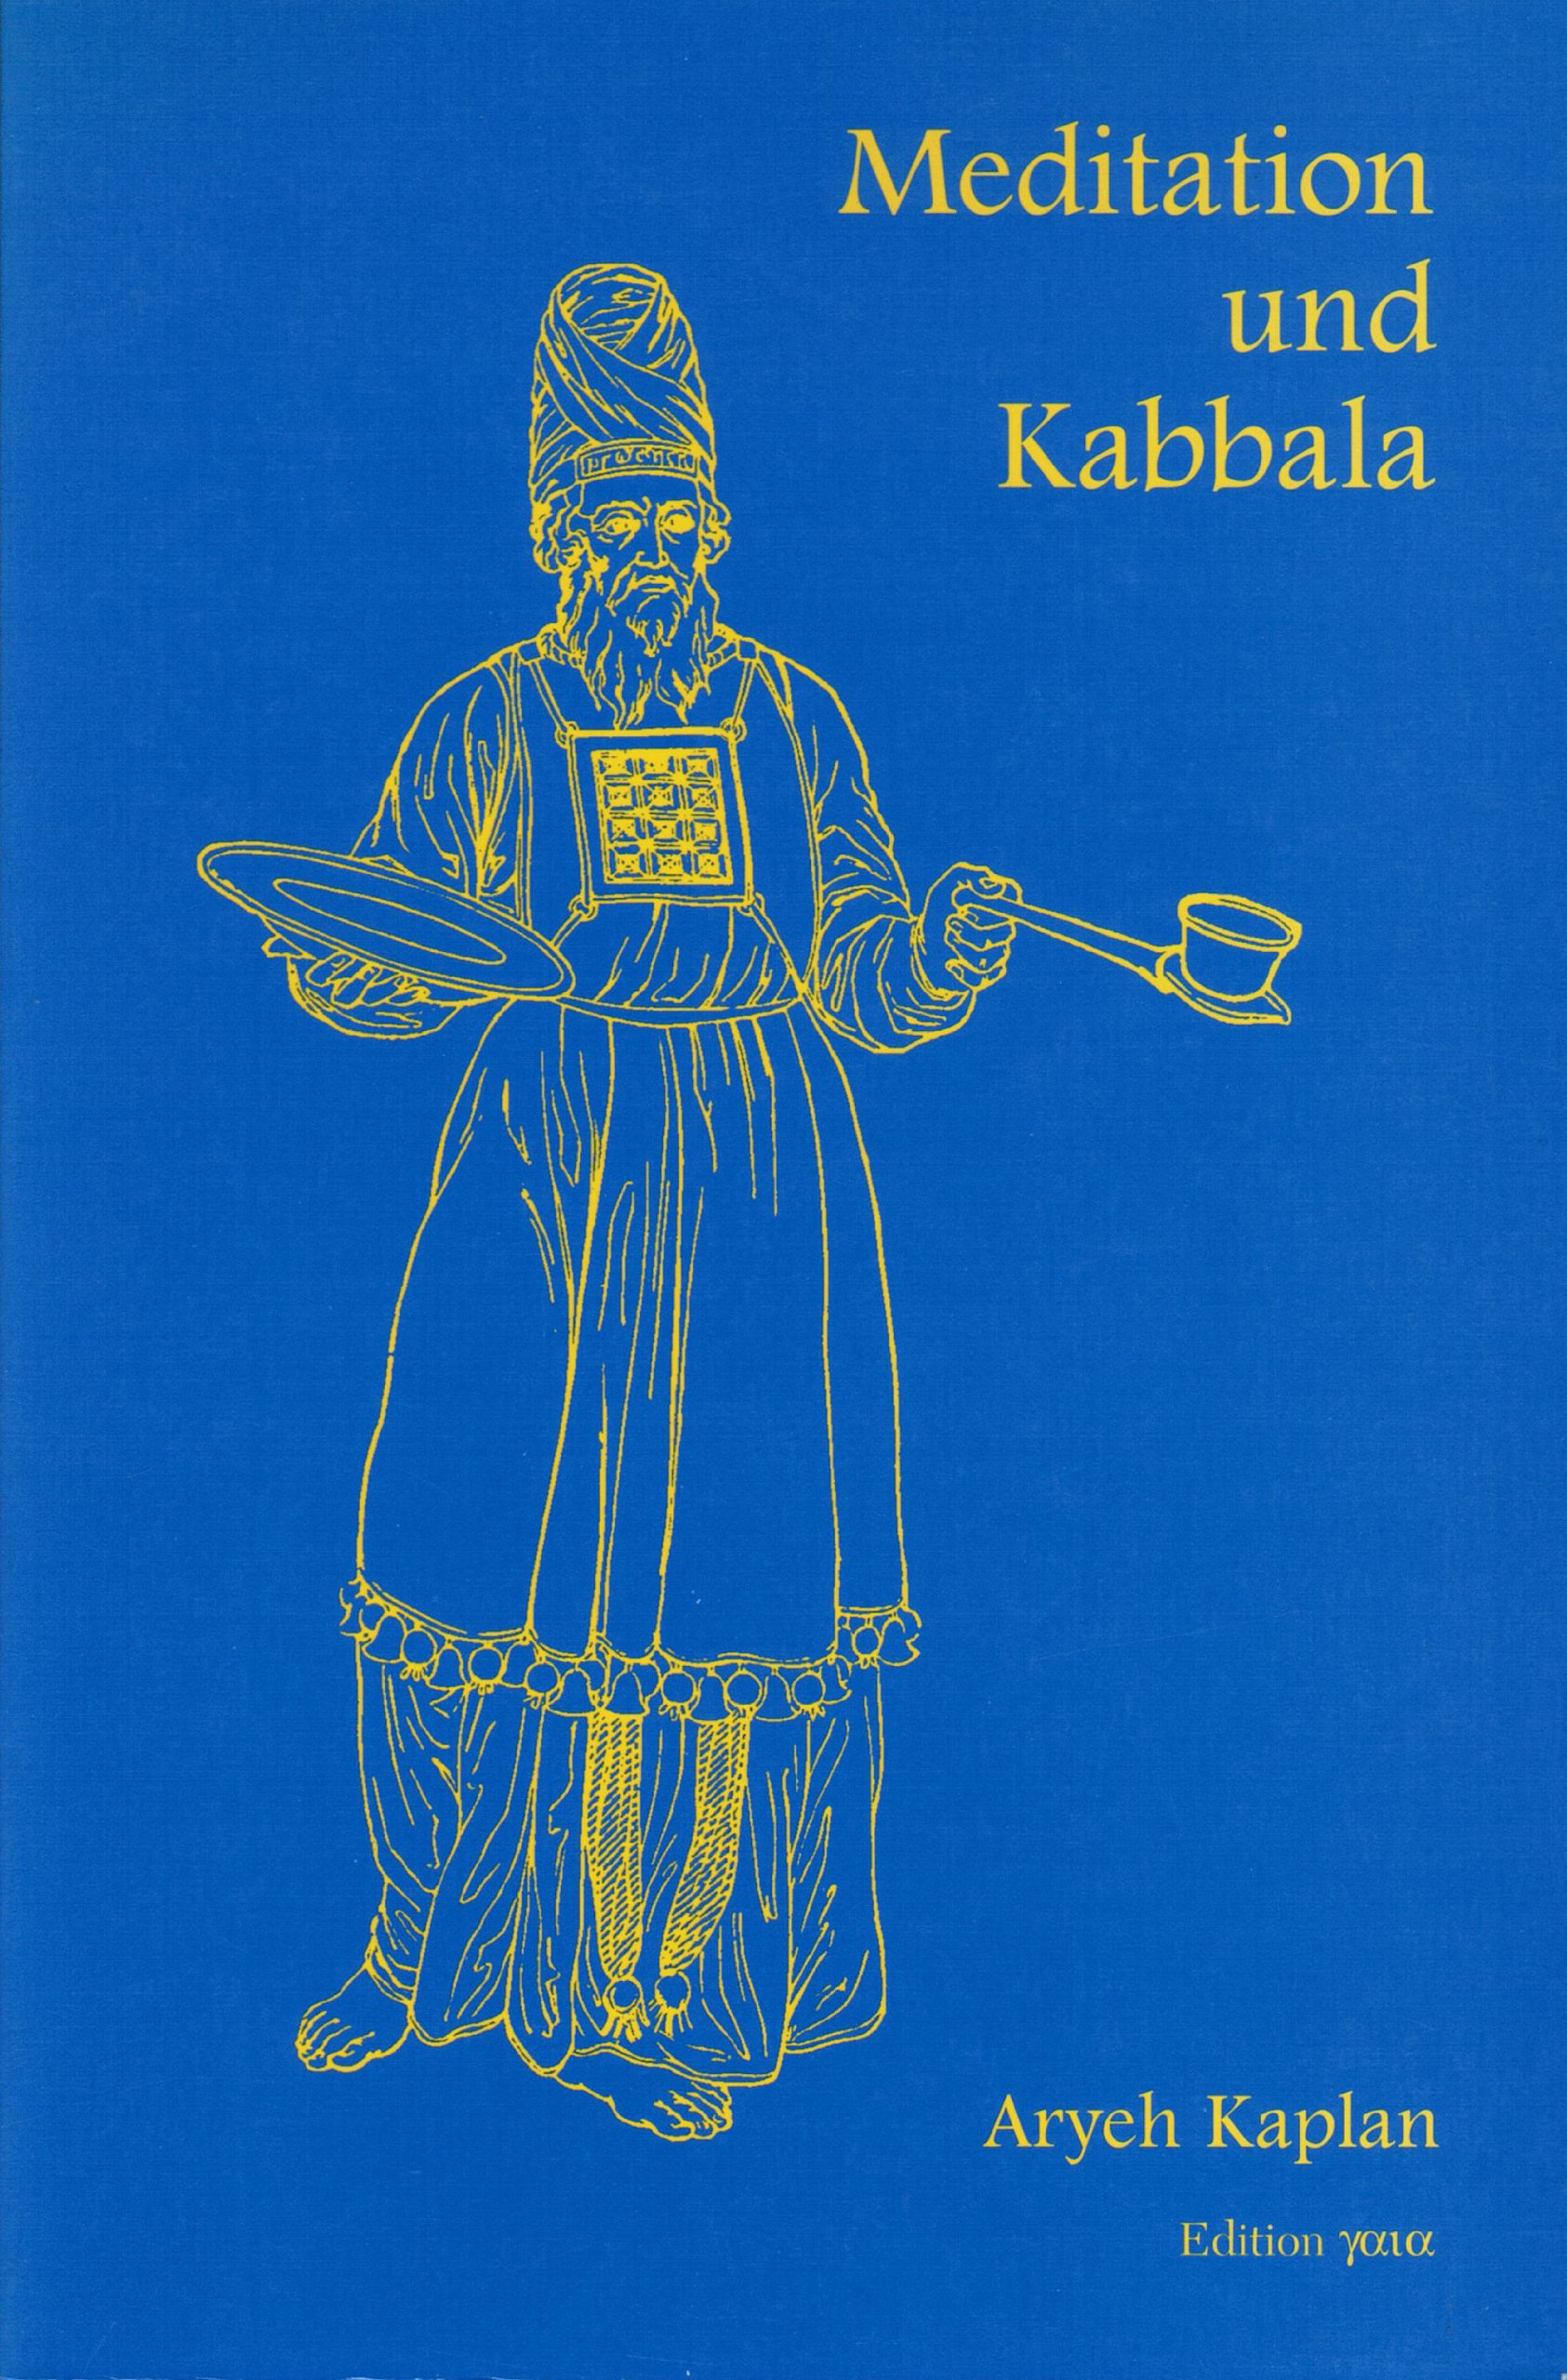 Meditation und Kabbala